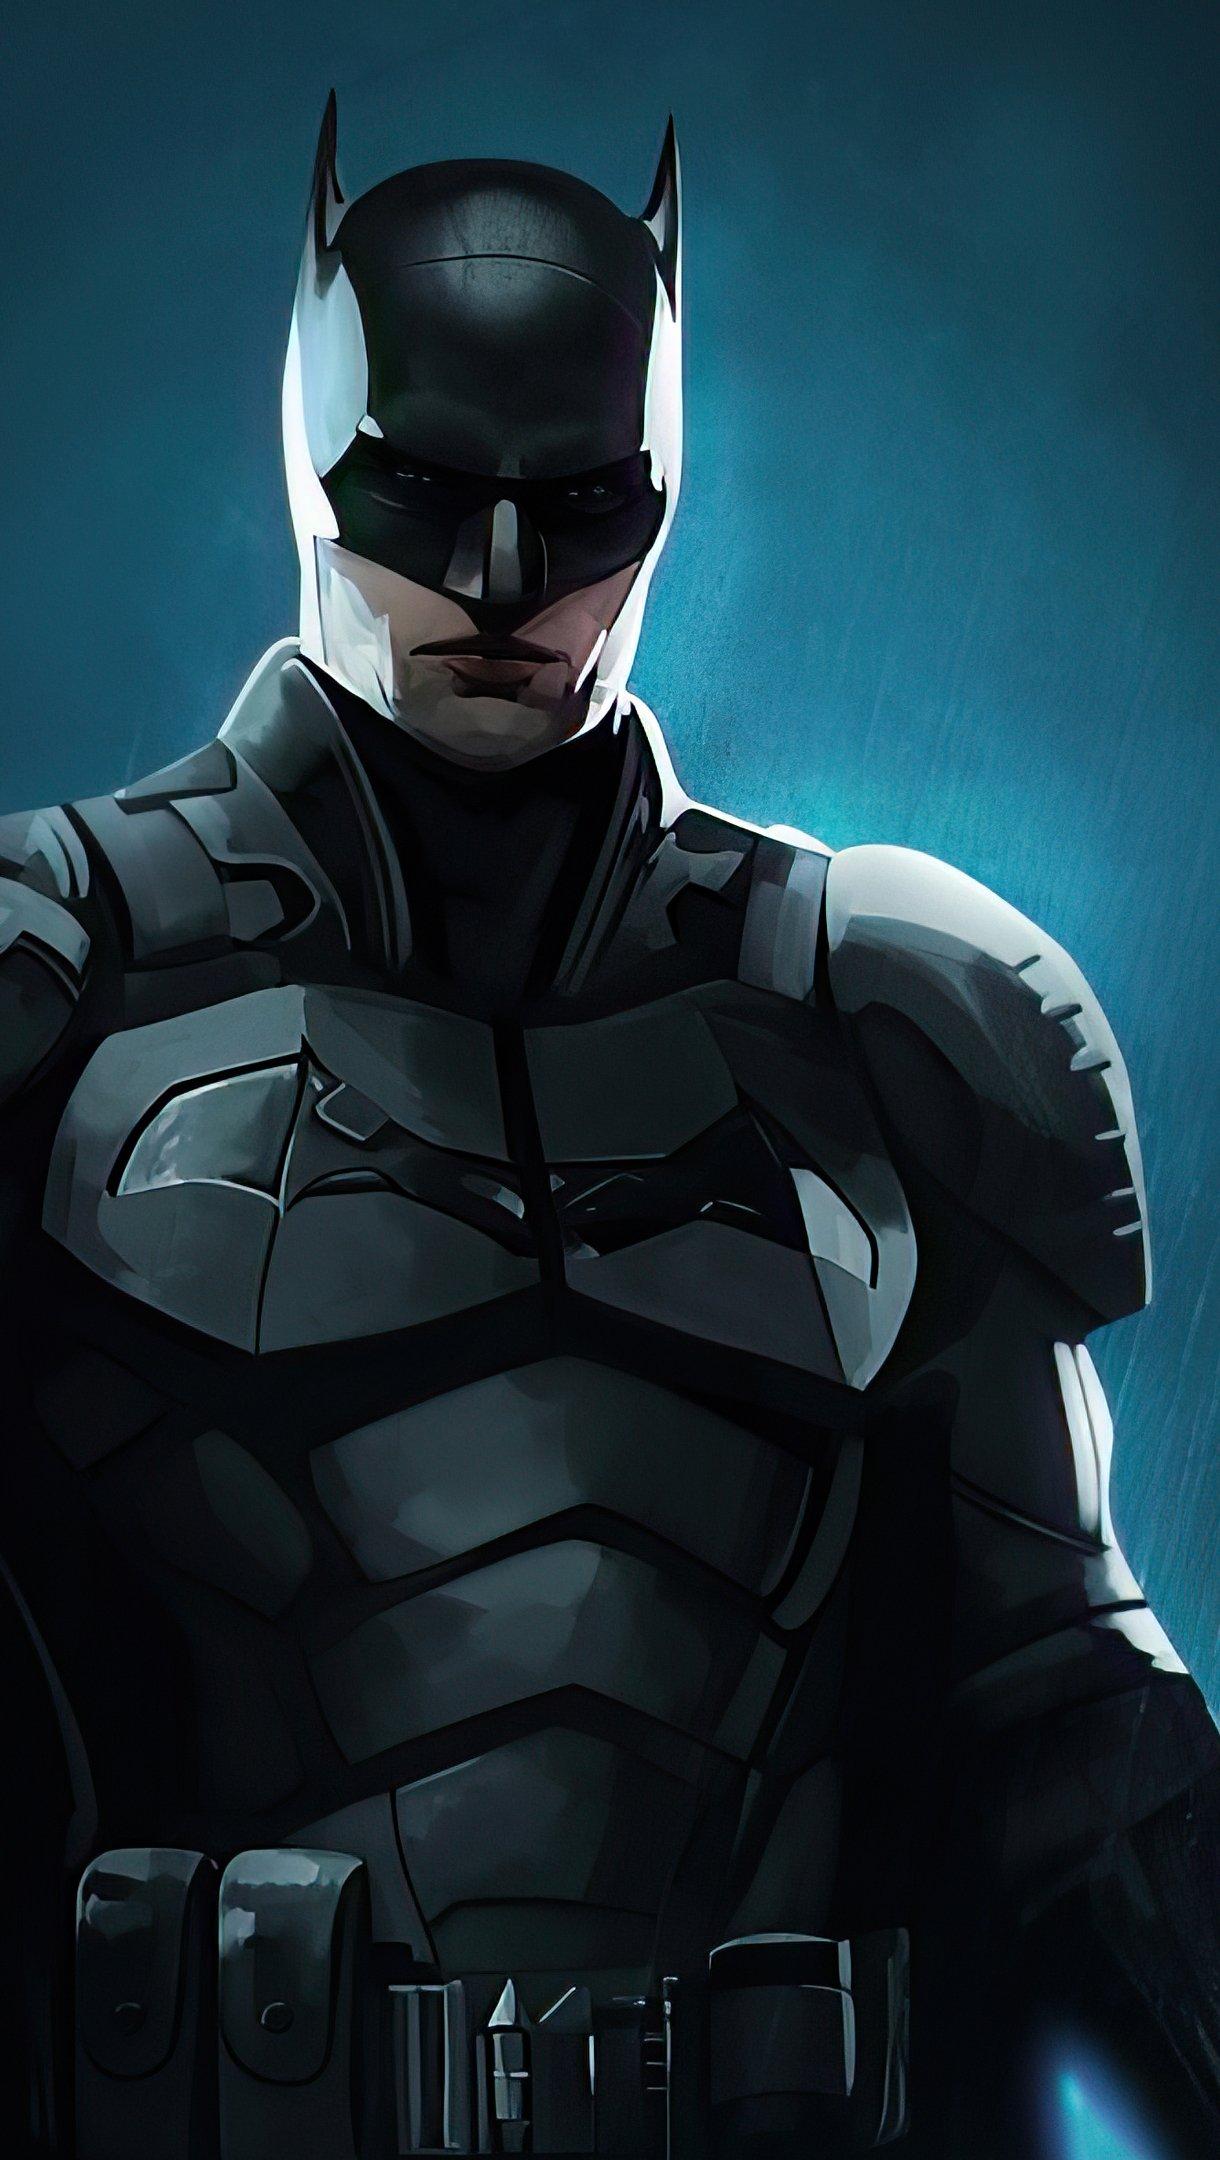 Fondos de pantalla Poster de The Batman 2021 Vertical